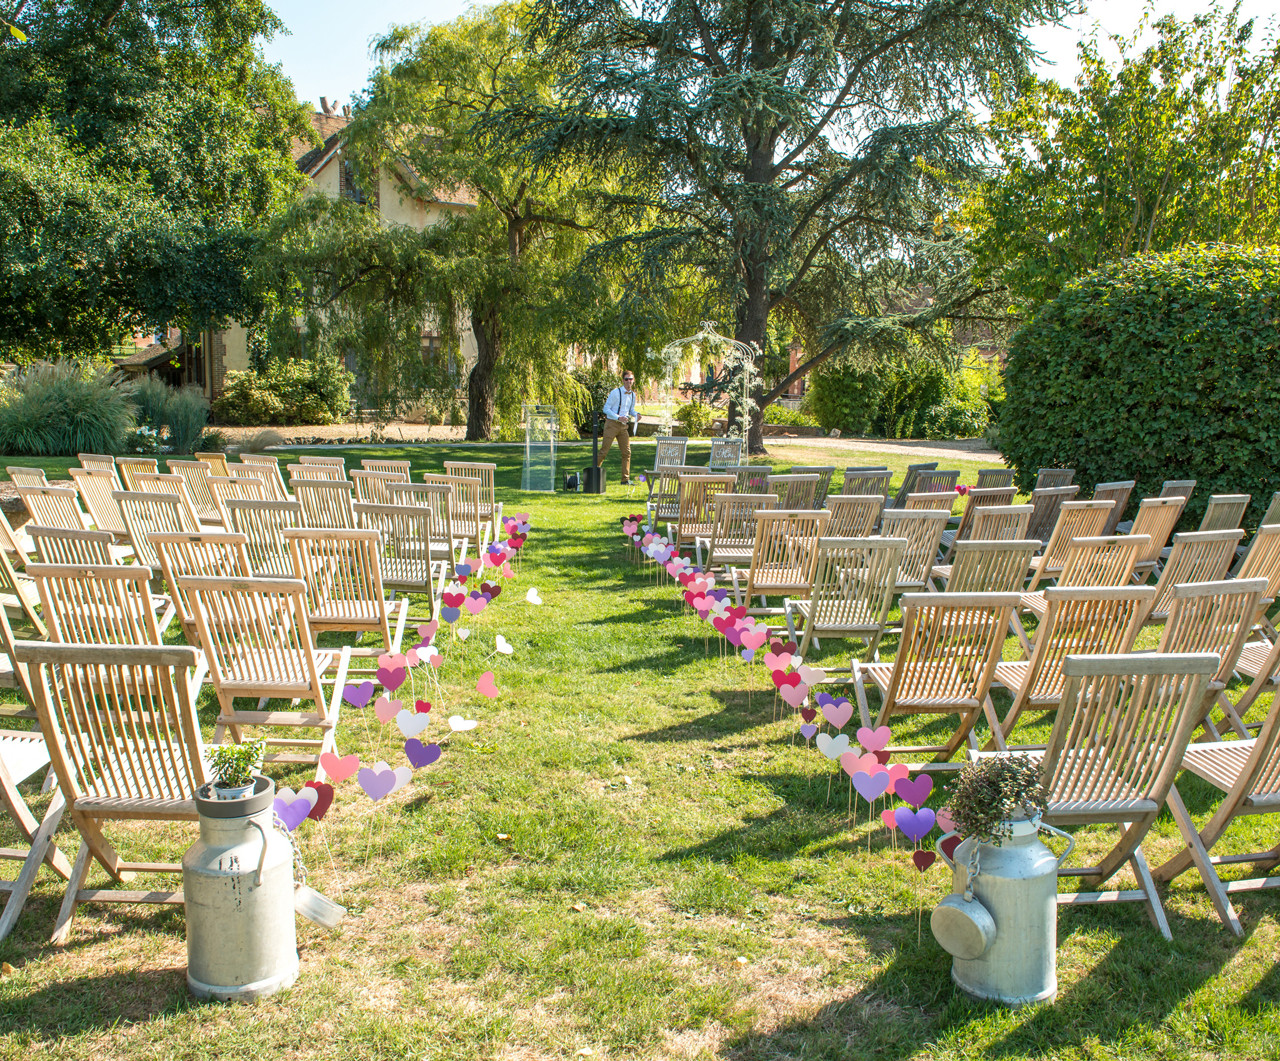 photographe-de-mariage-lieu-95-(3)